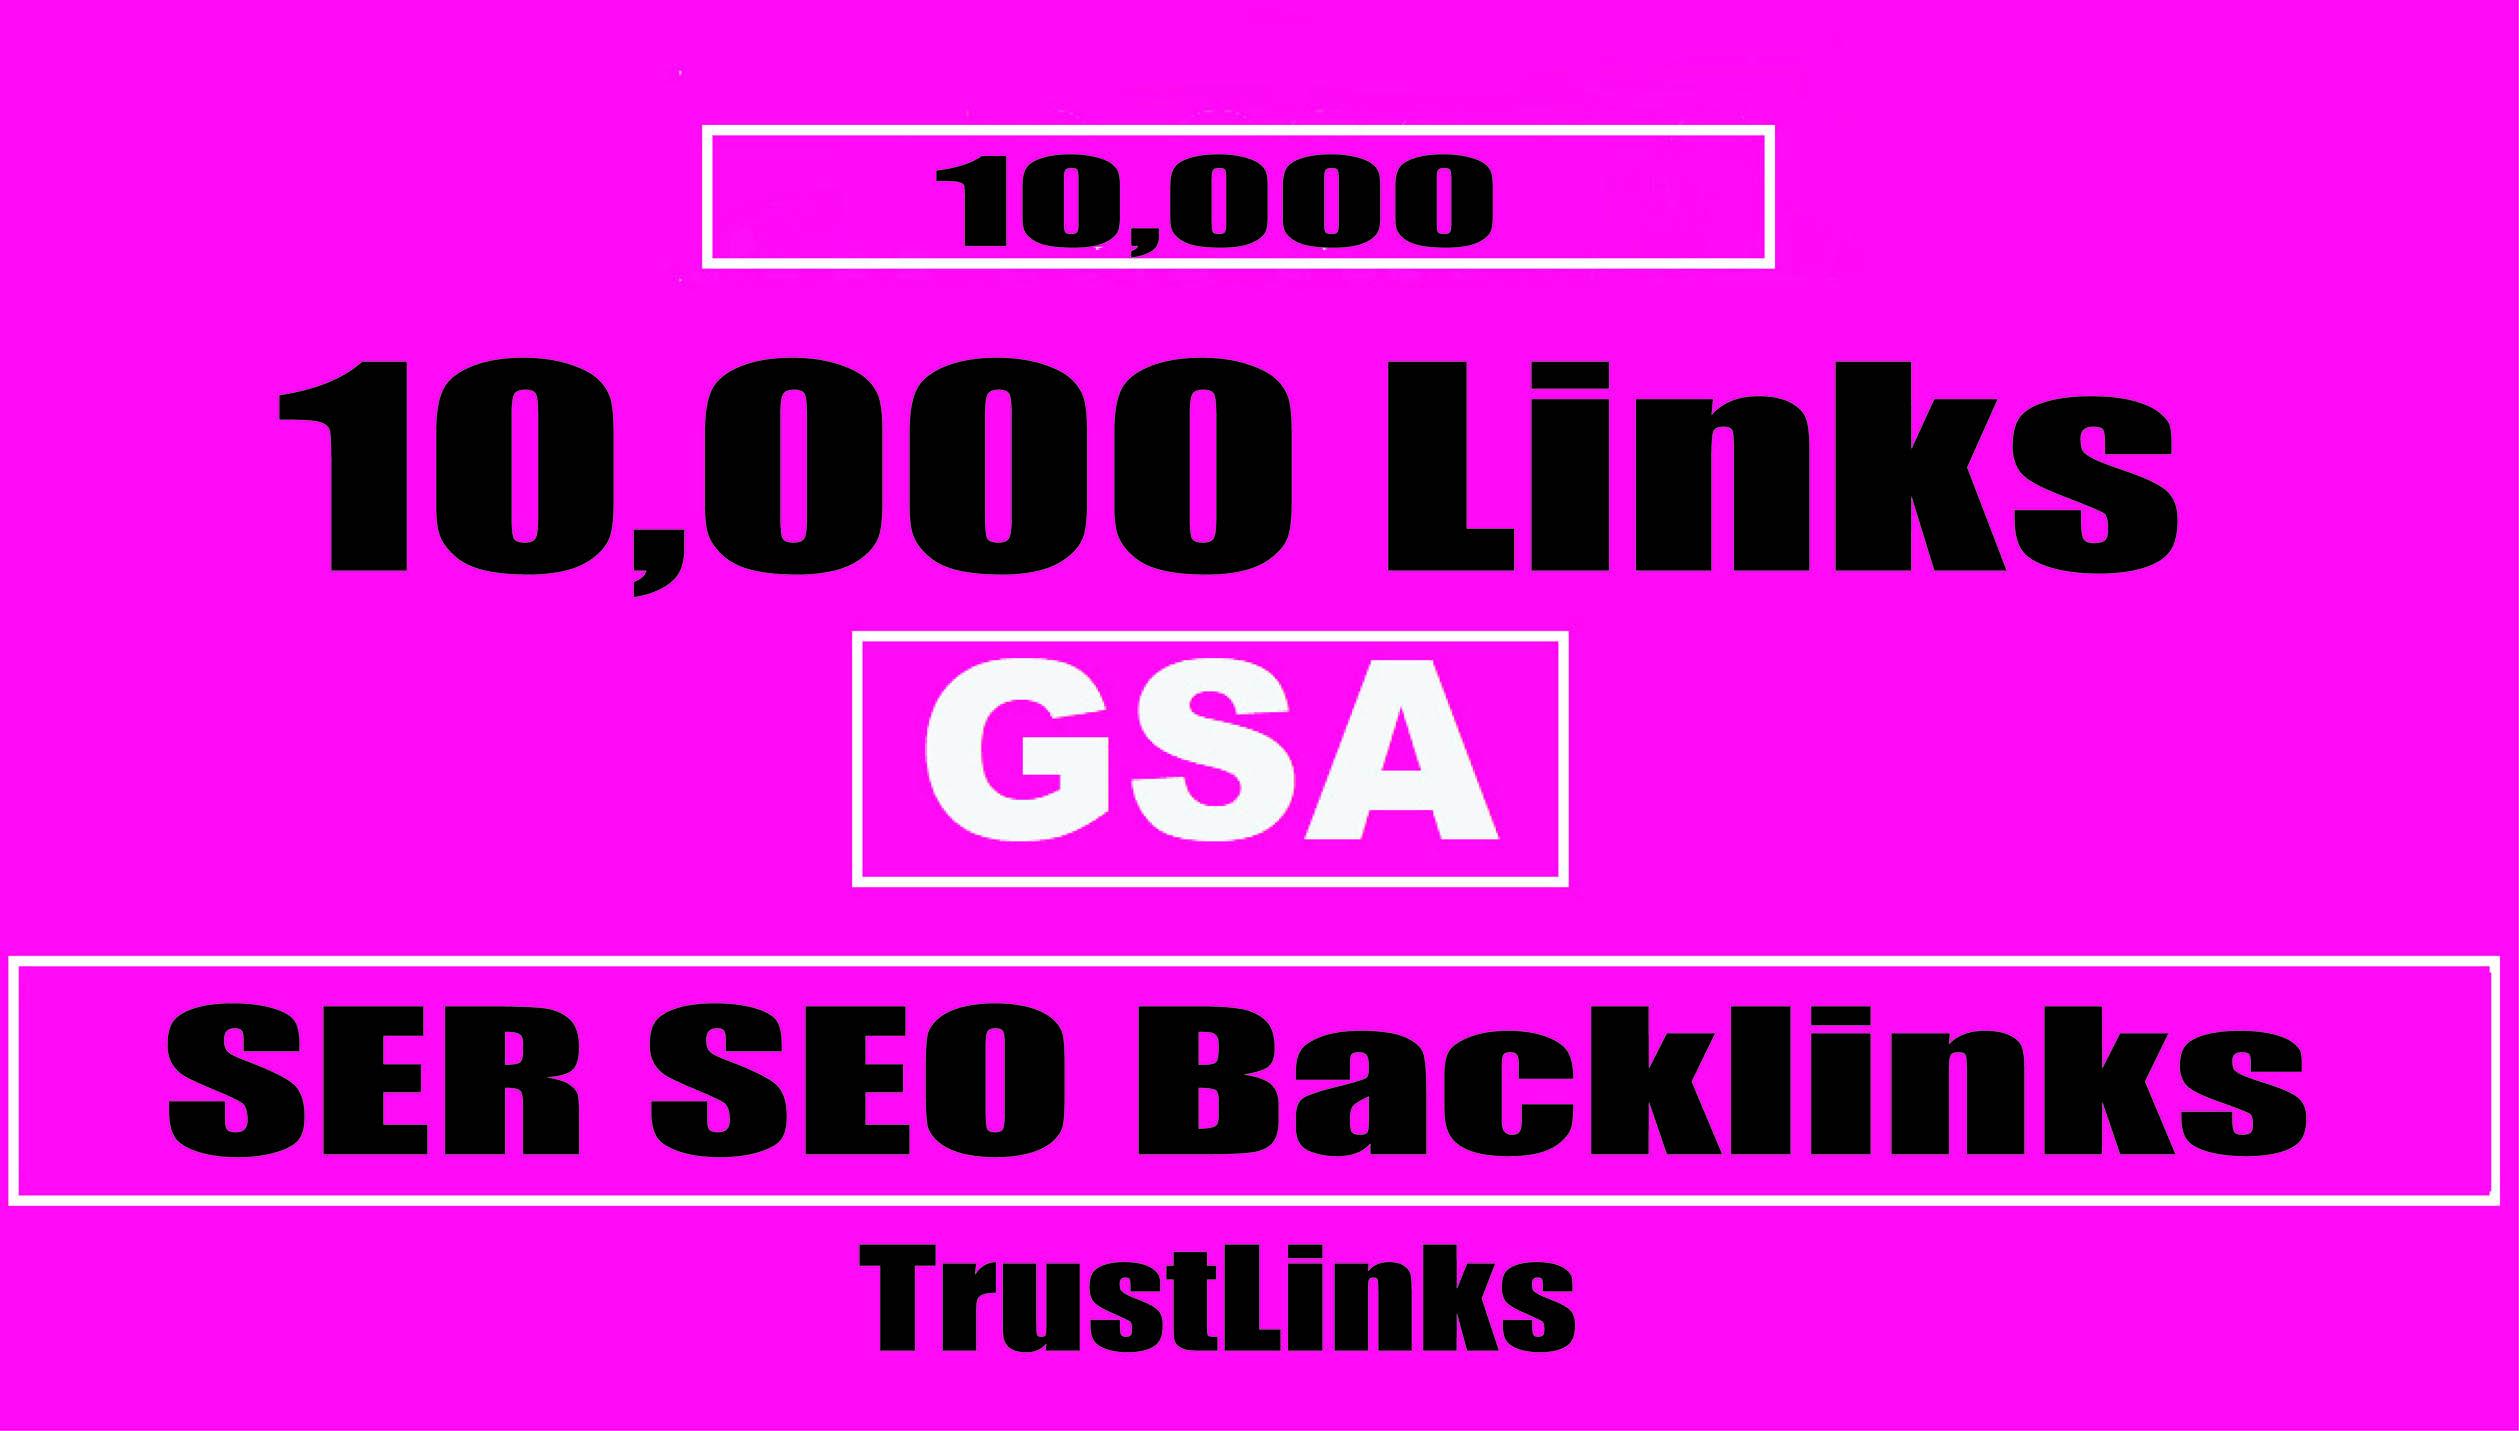 create 10,000+ GSA SER Backlinks for quick ranking on google